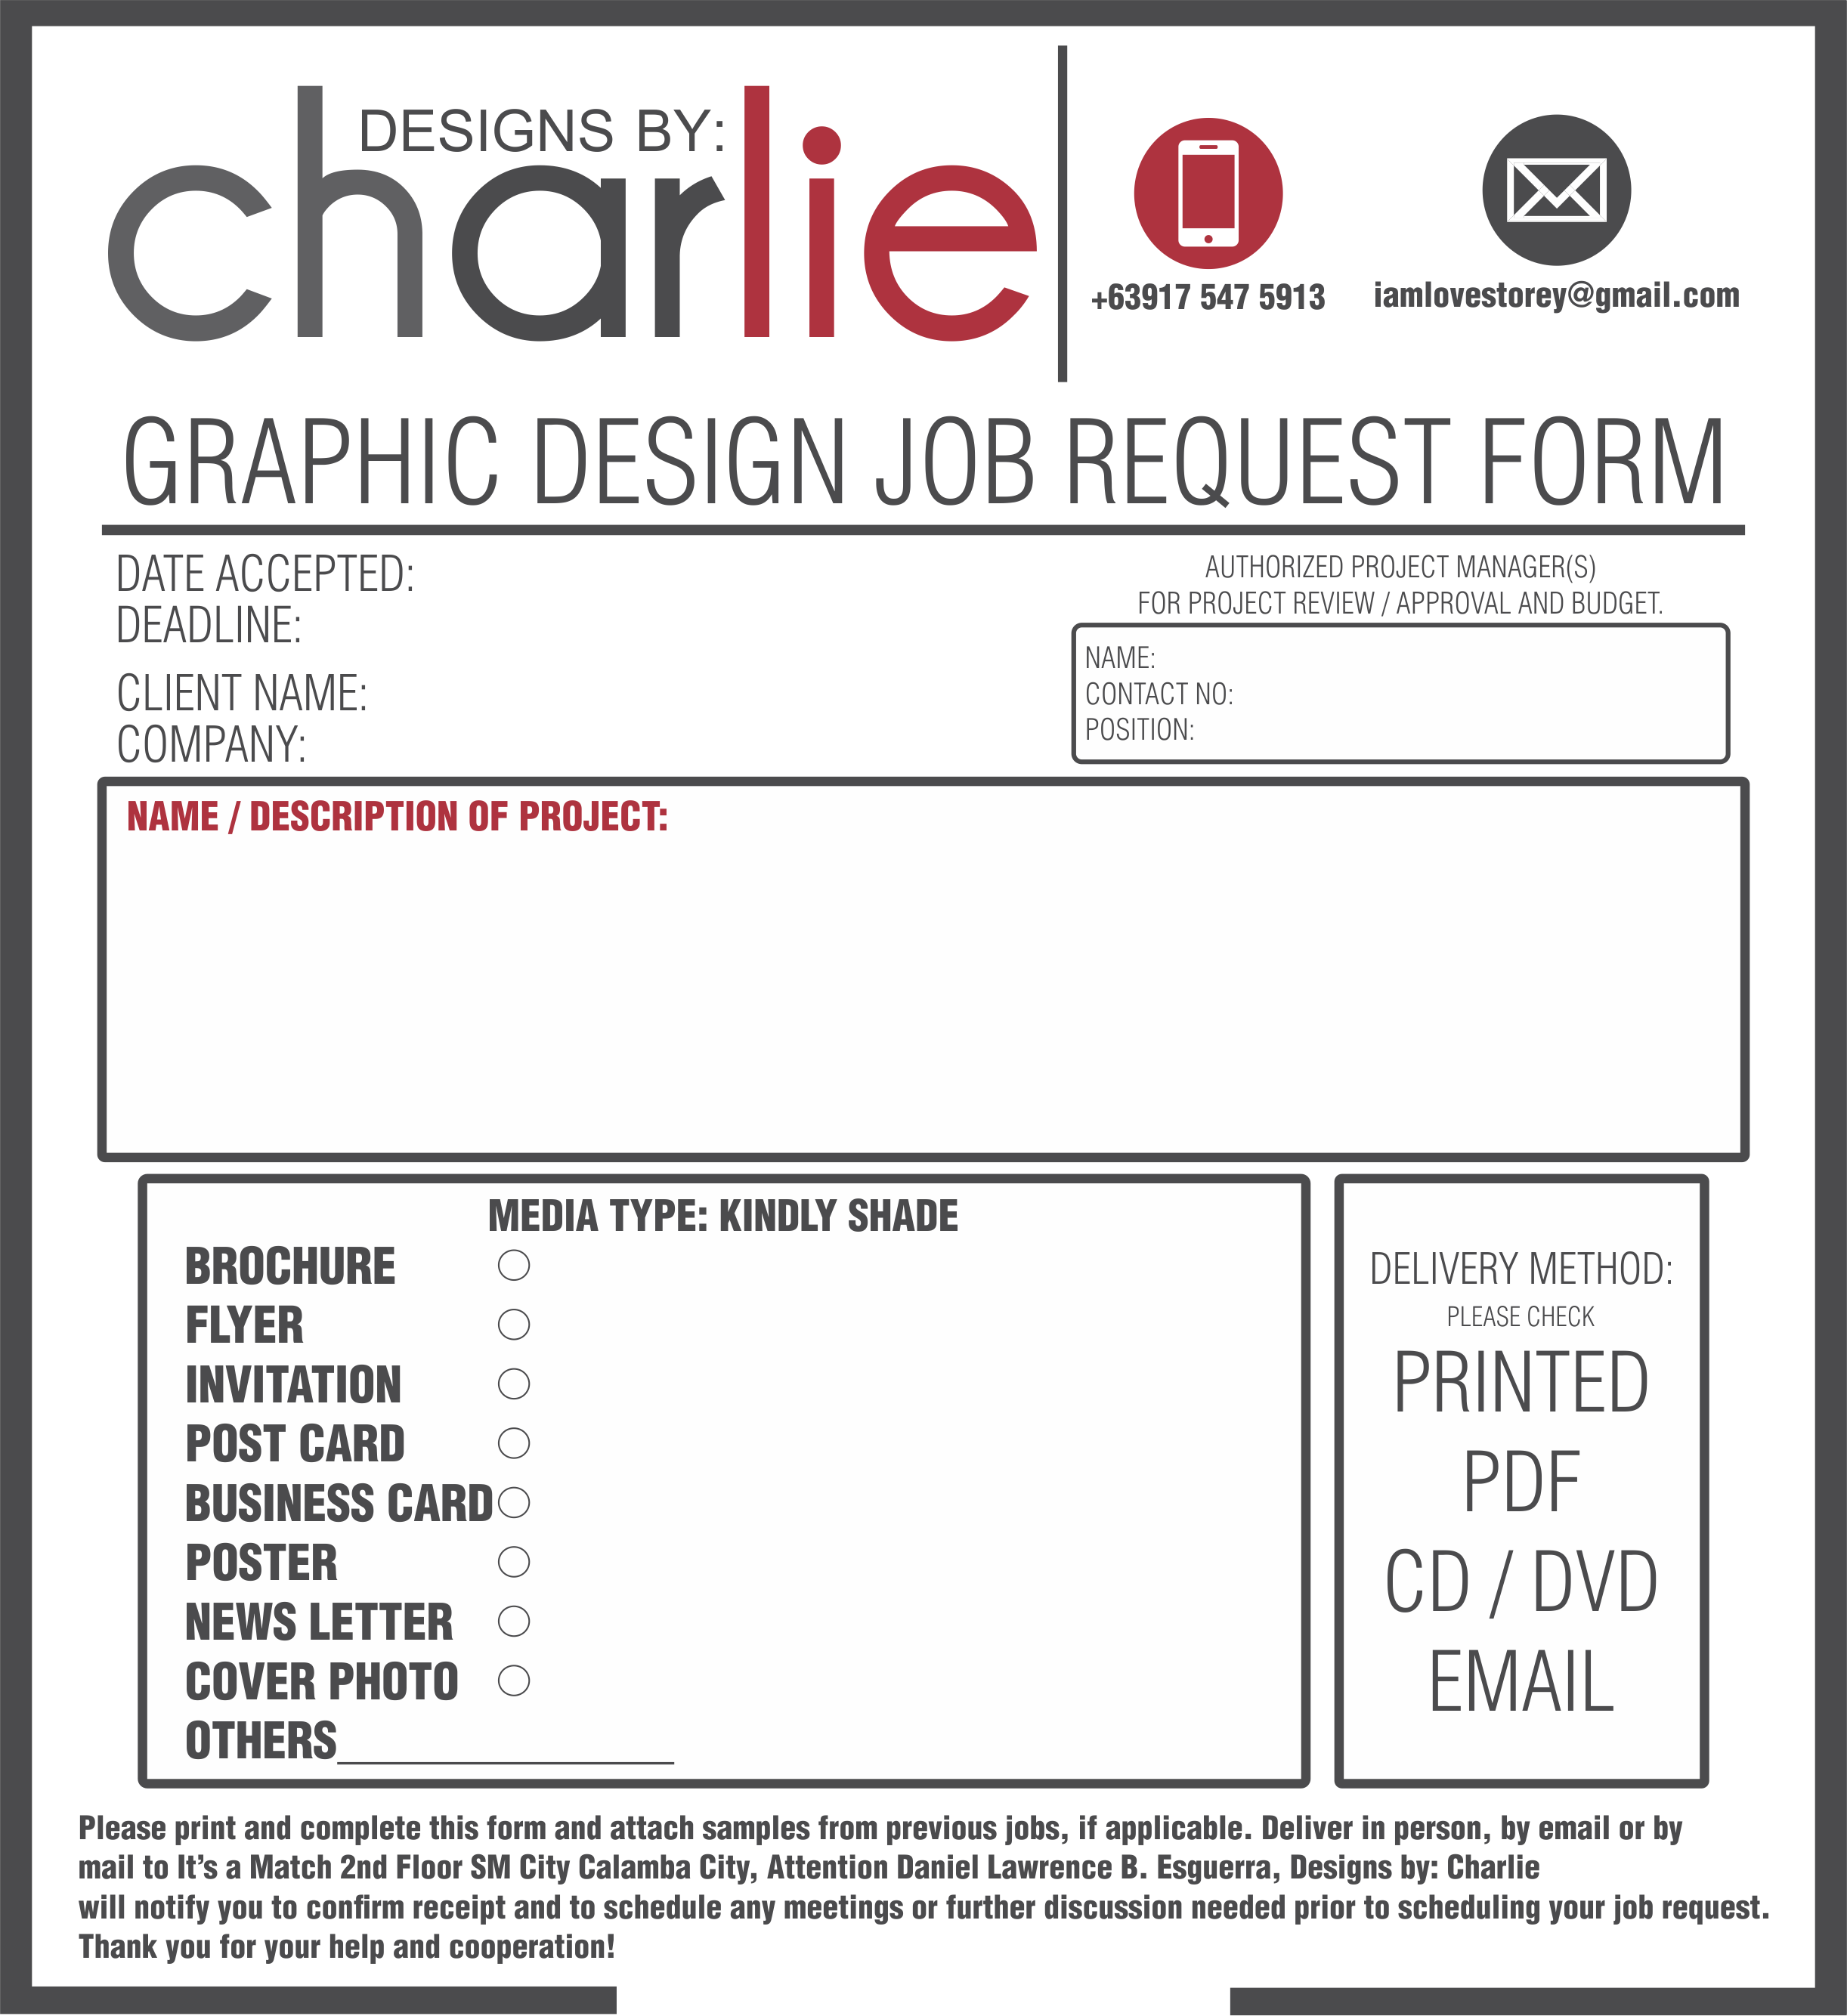 Job Order Form Graphic Design Jobs Graphic Design Business Design Jobs